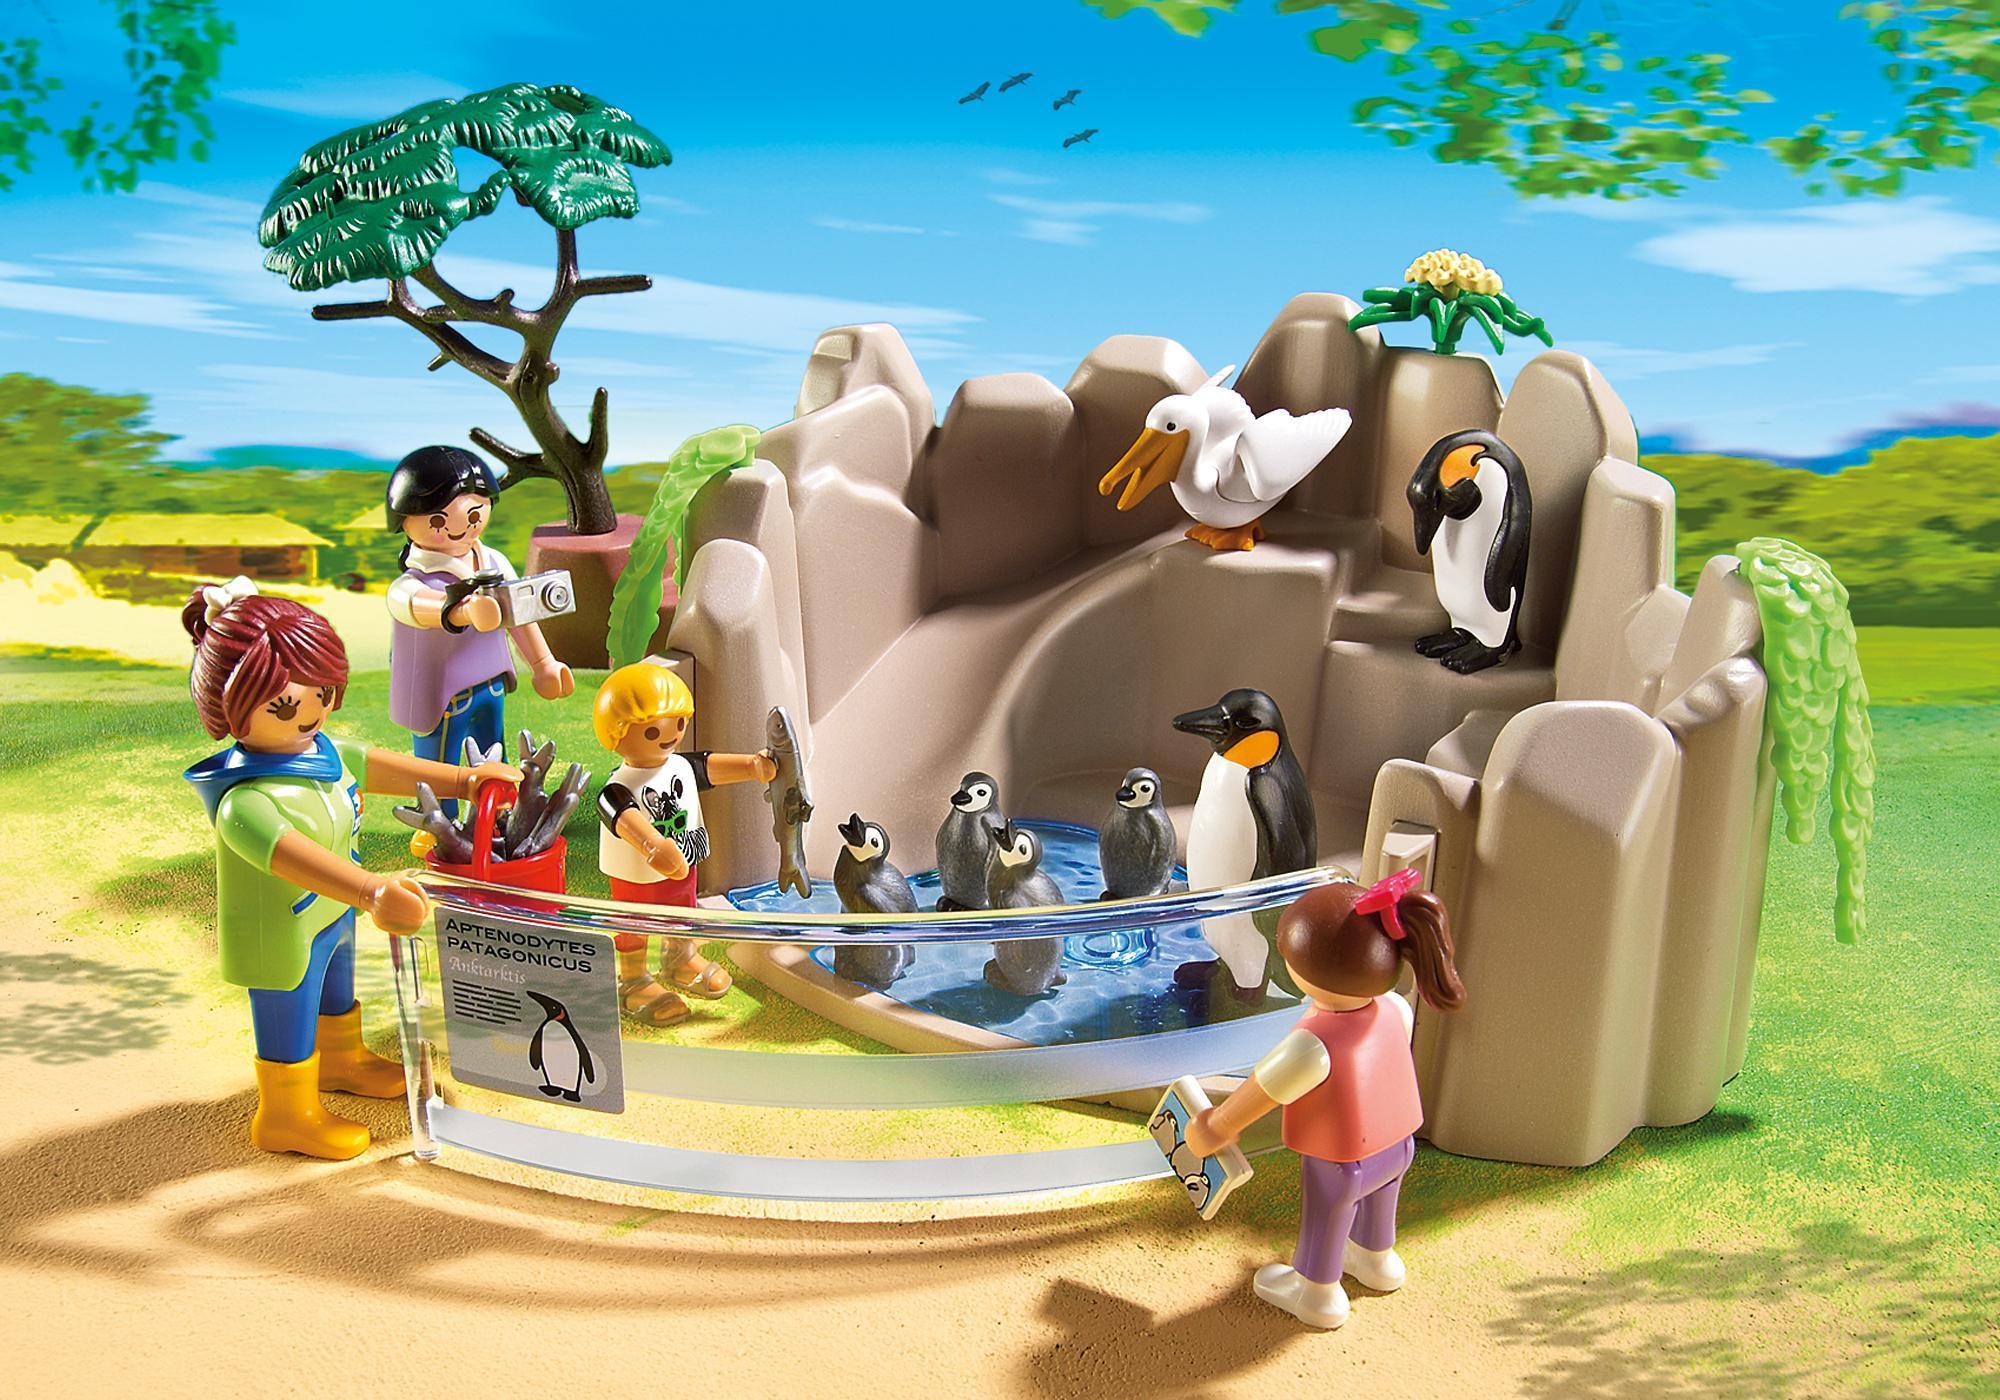 http://media.playmobil.com/i/playmobil/6634_product_extra3